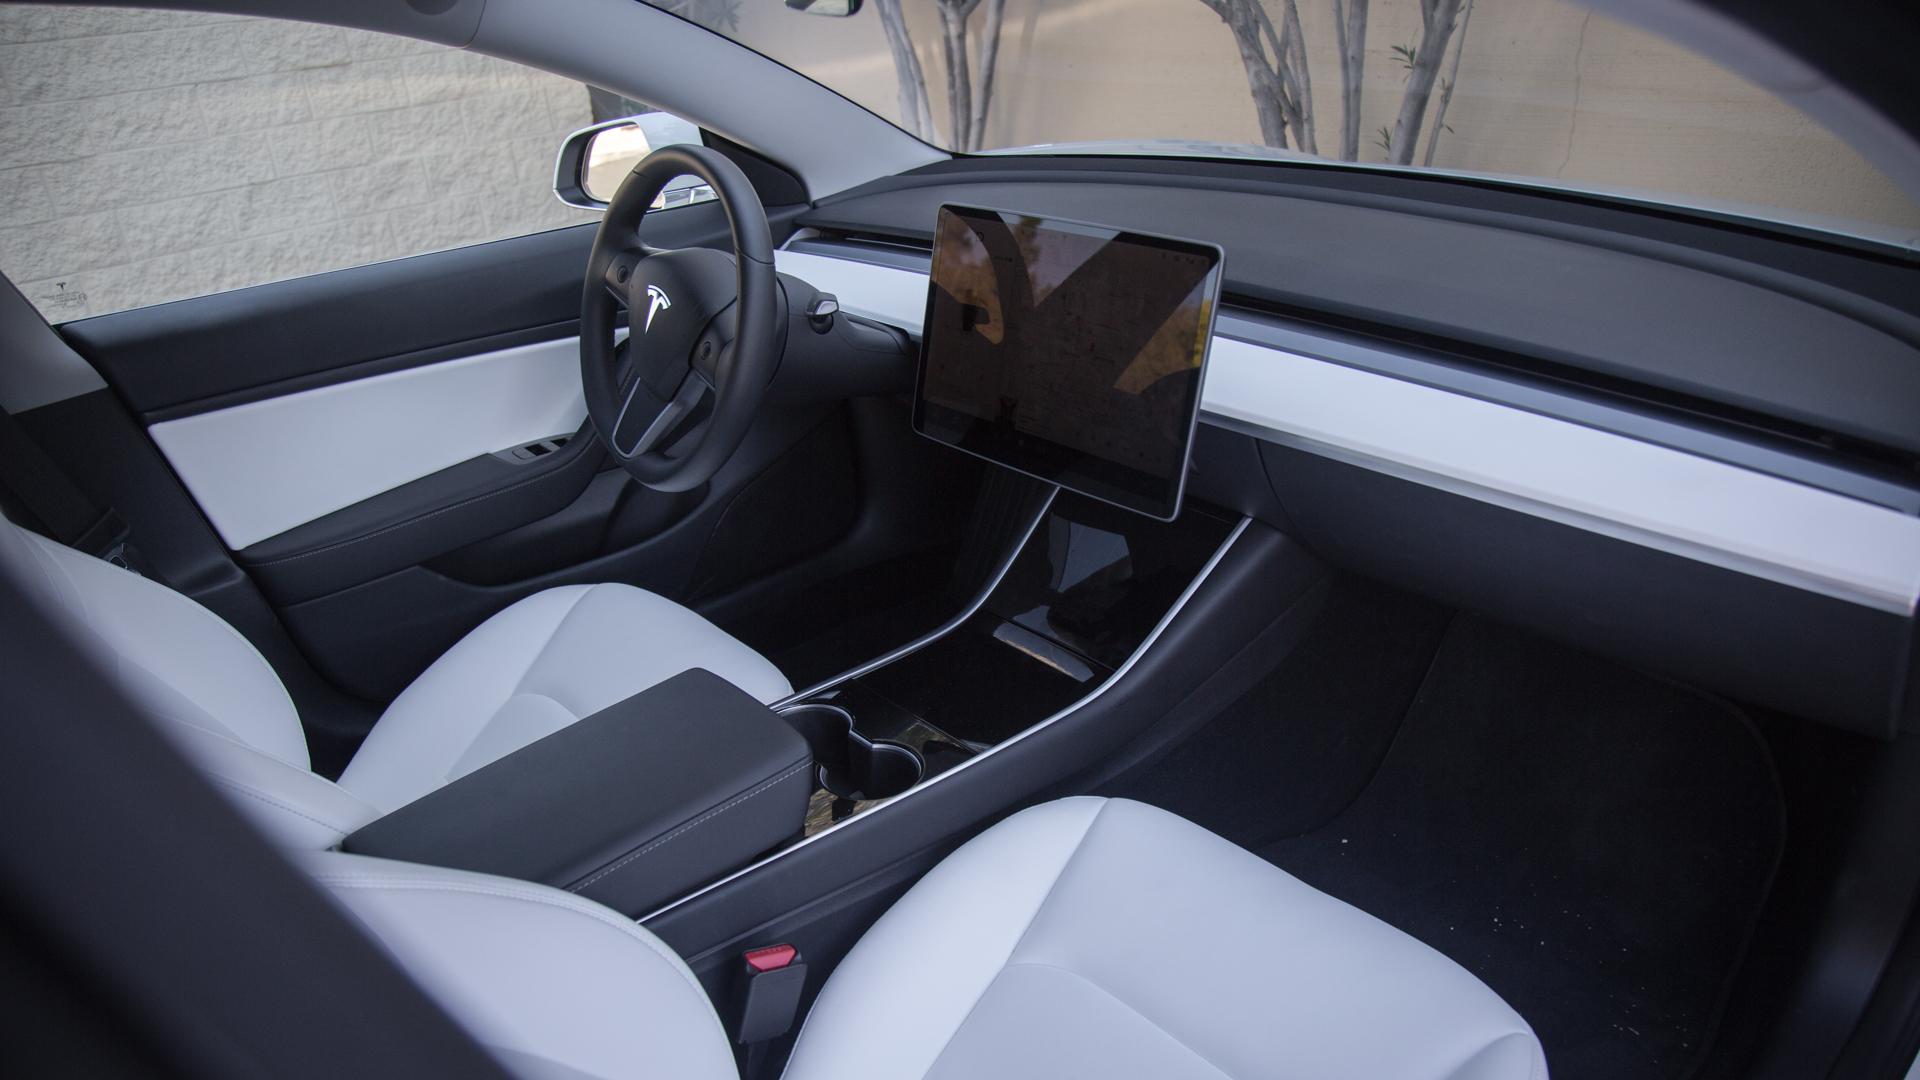 Tesla Model 3 Awd Long Range Joins Australian Line Up Caradvice